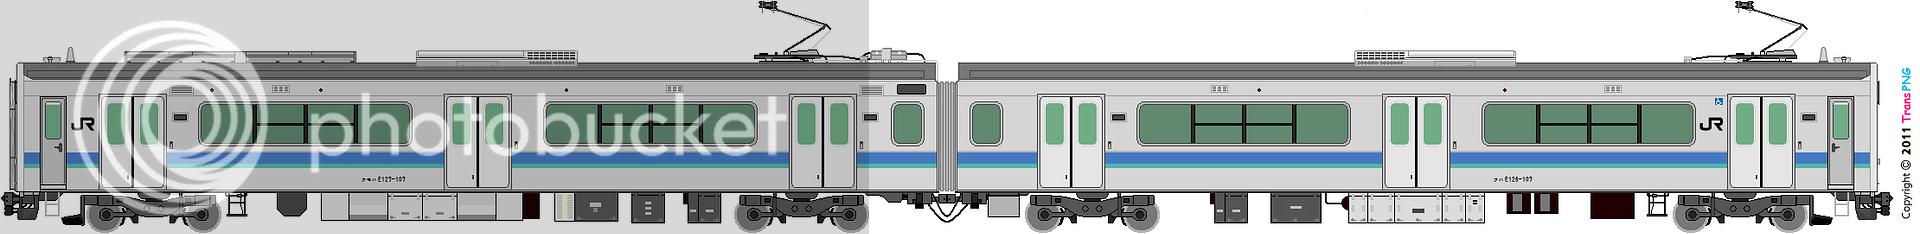 Train 2271